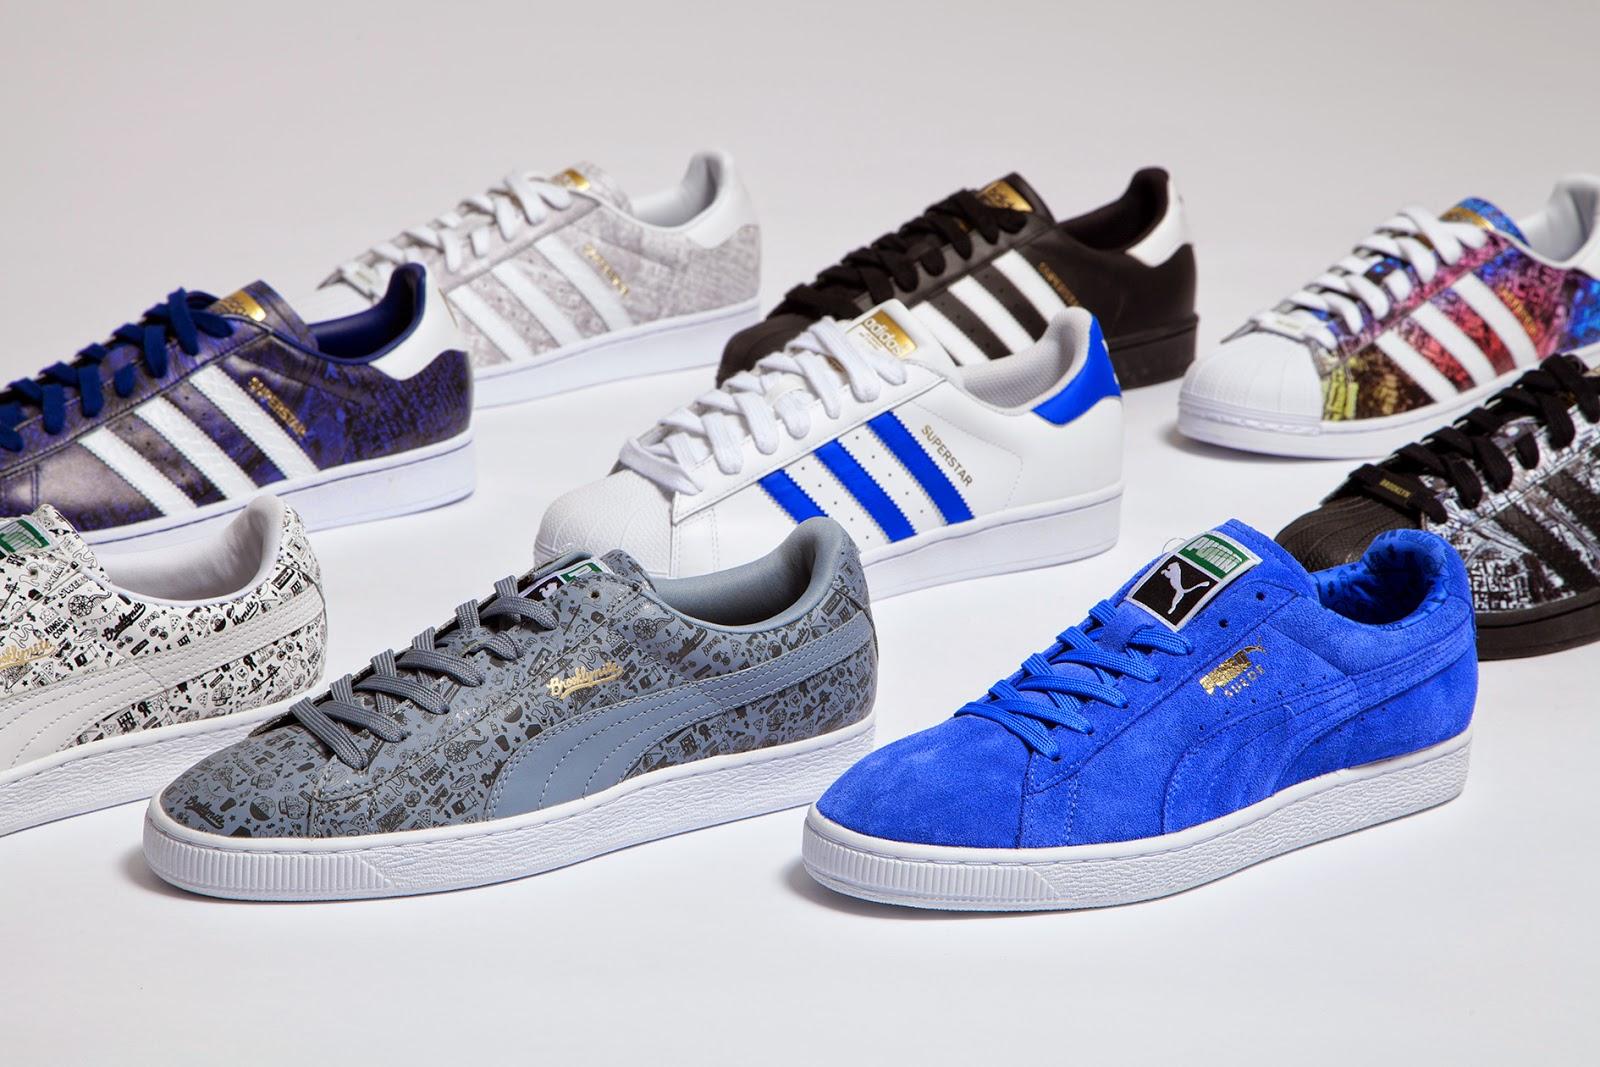 ATOMLABOR BLOG SNEAKER NEWS : FOOTLOCKER-RELEASE-WAHNSINN IM FEBRUAR  28 Tage und 150 Sneaker Releases - #ITMUSTBEFEB